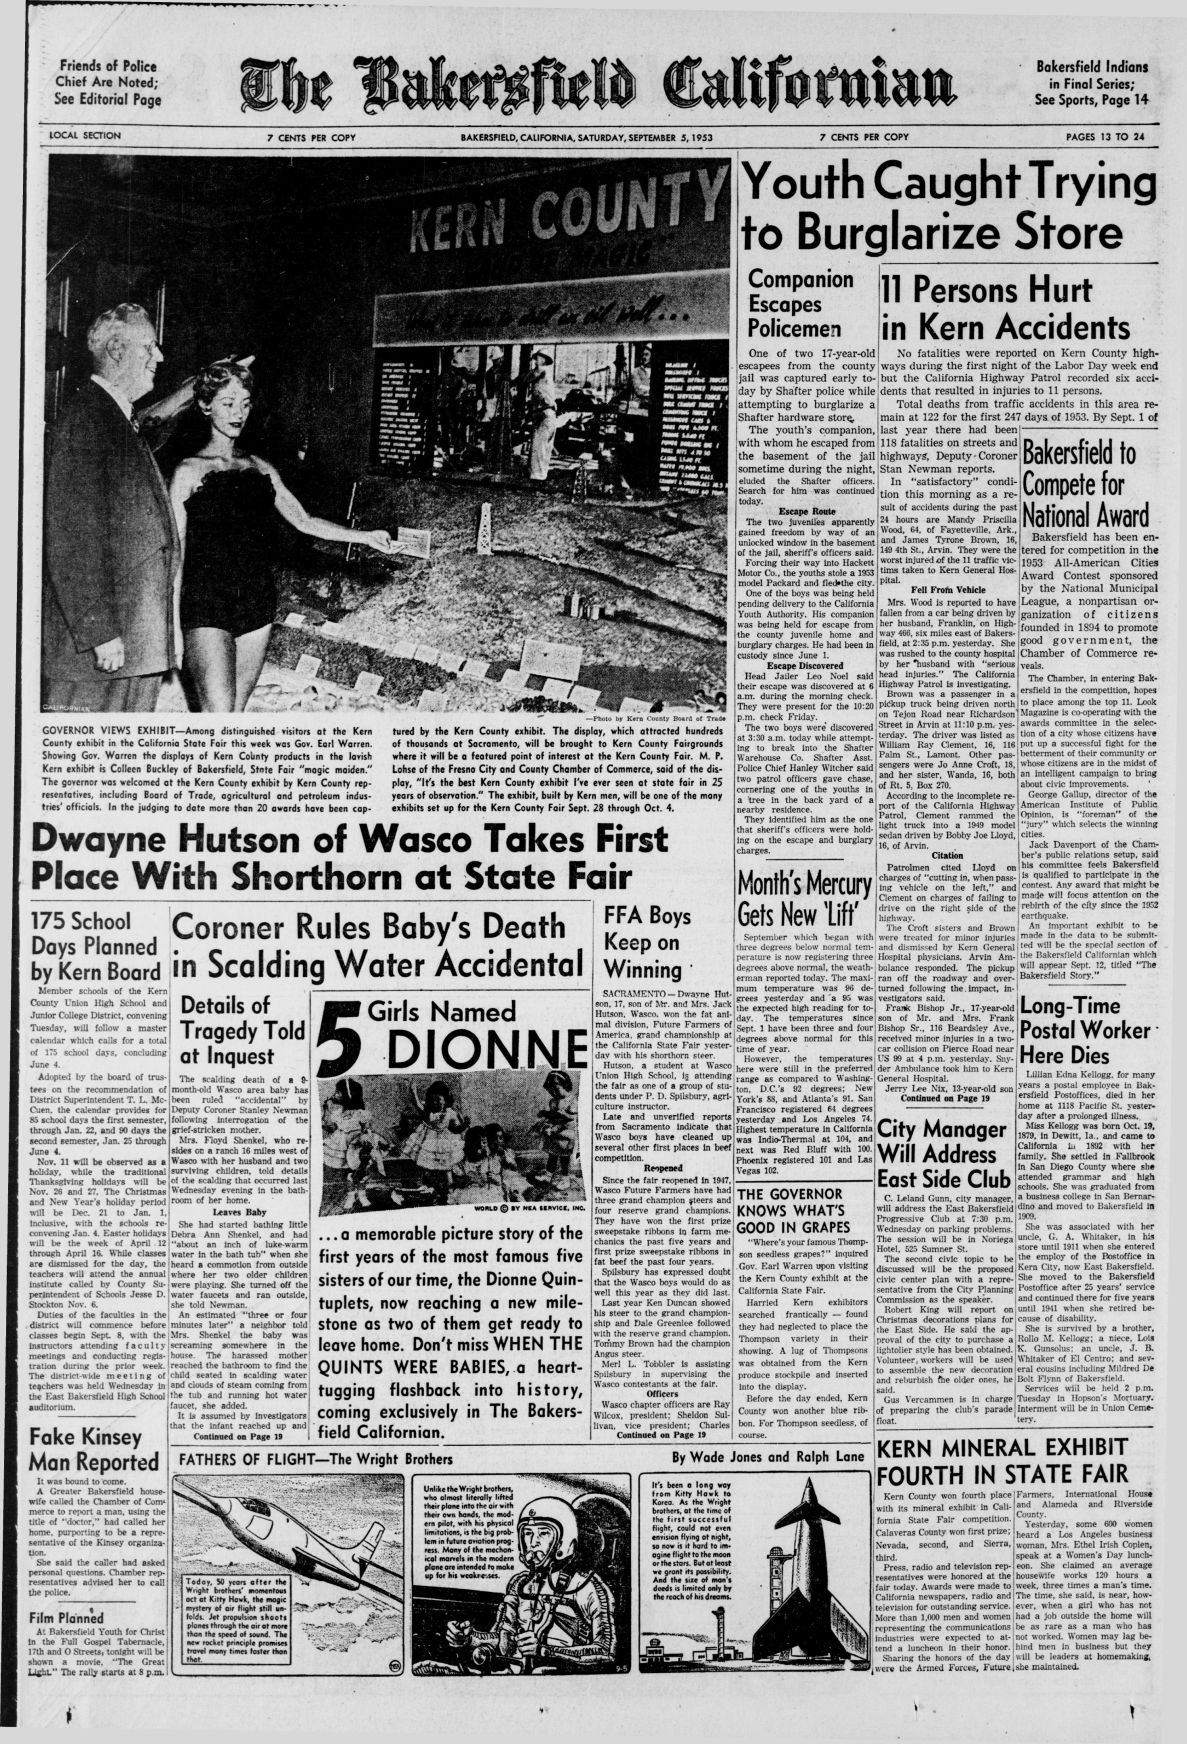 TBC TIME CAPSULE: Sept. 5, 1953